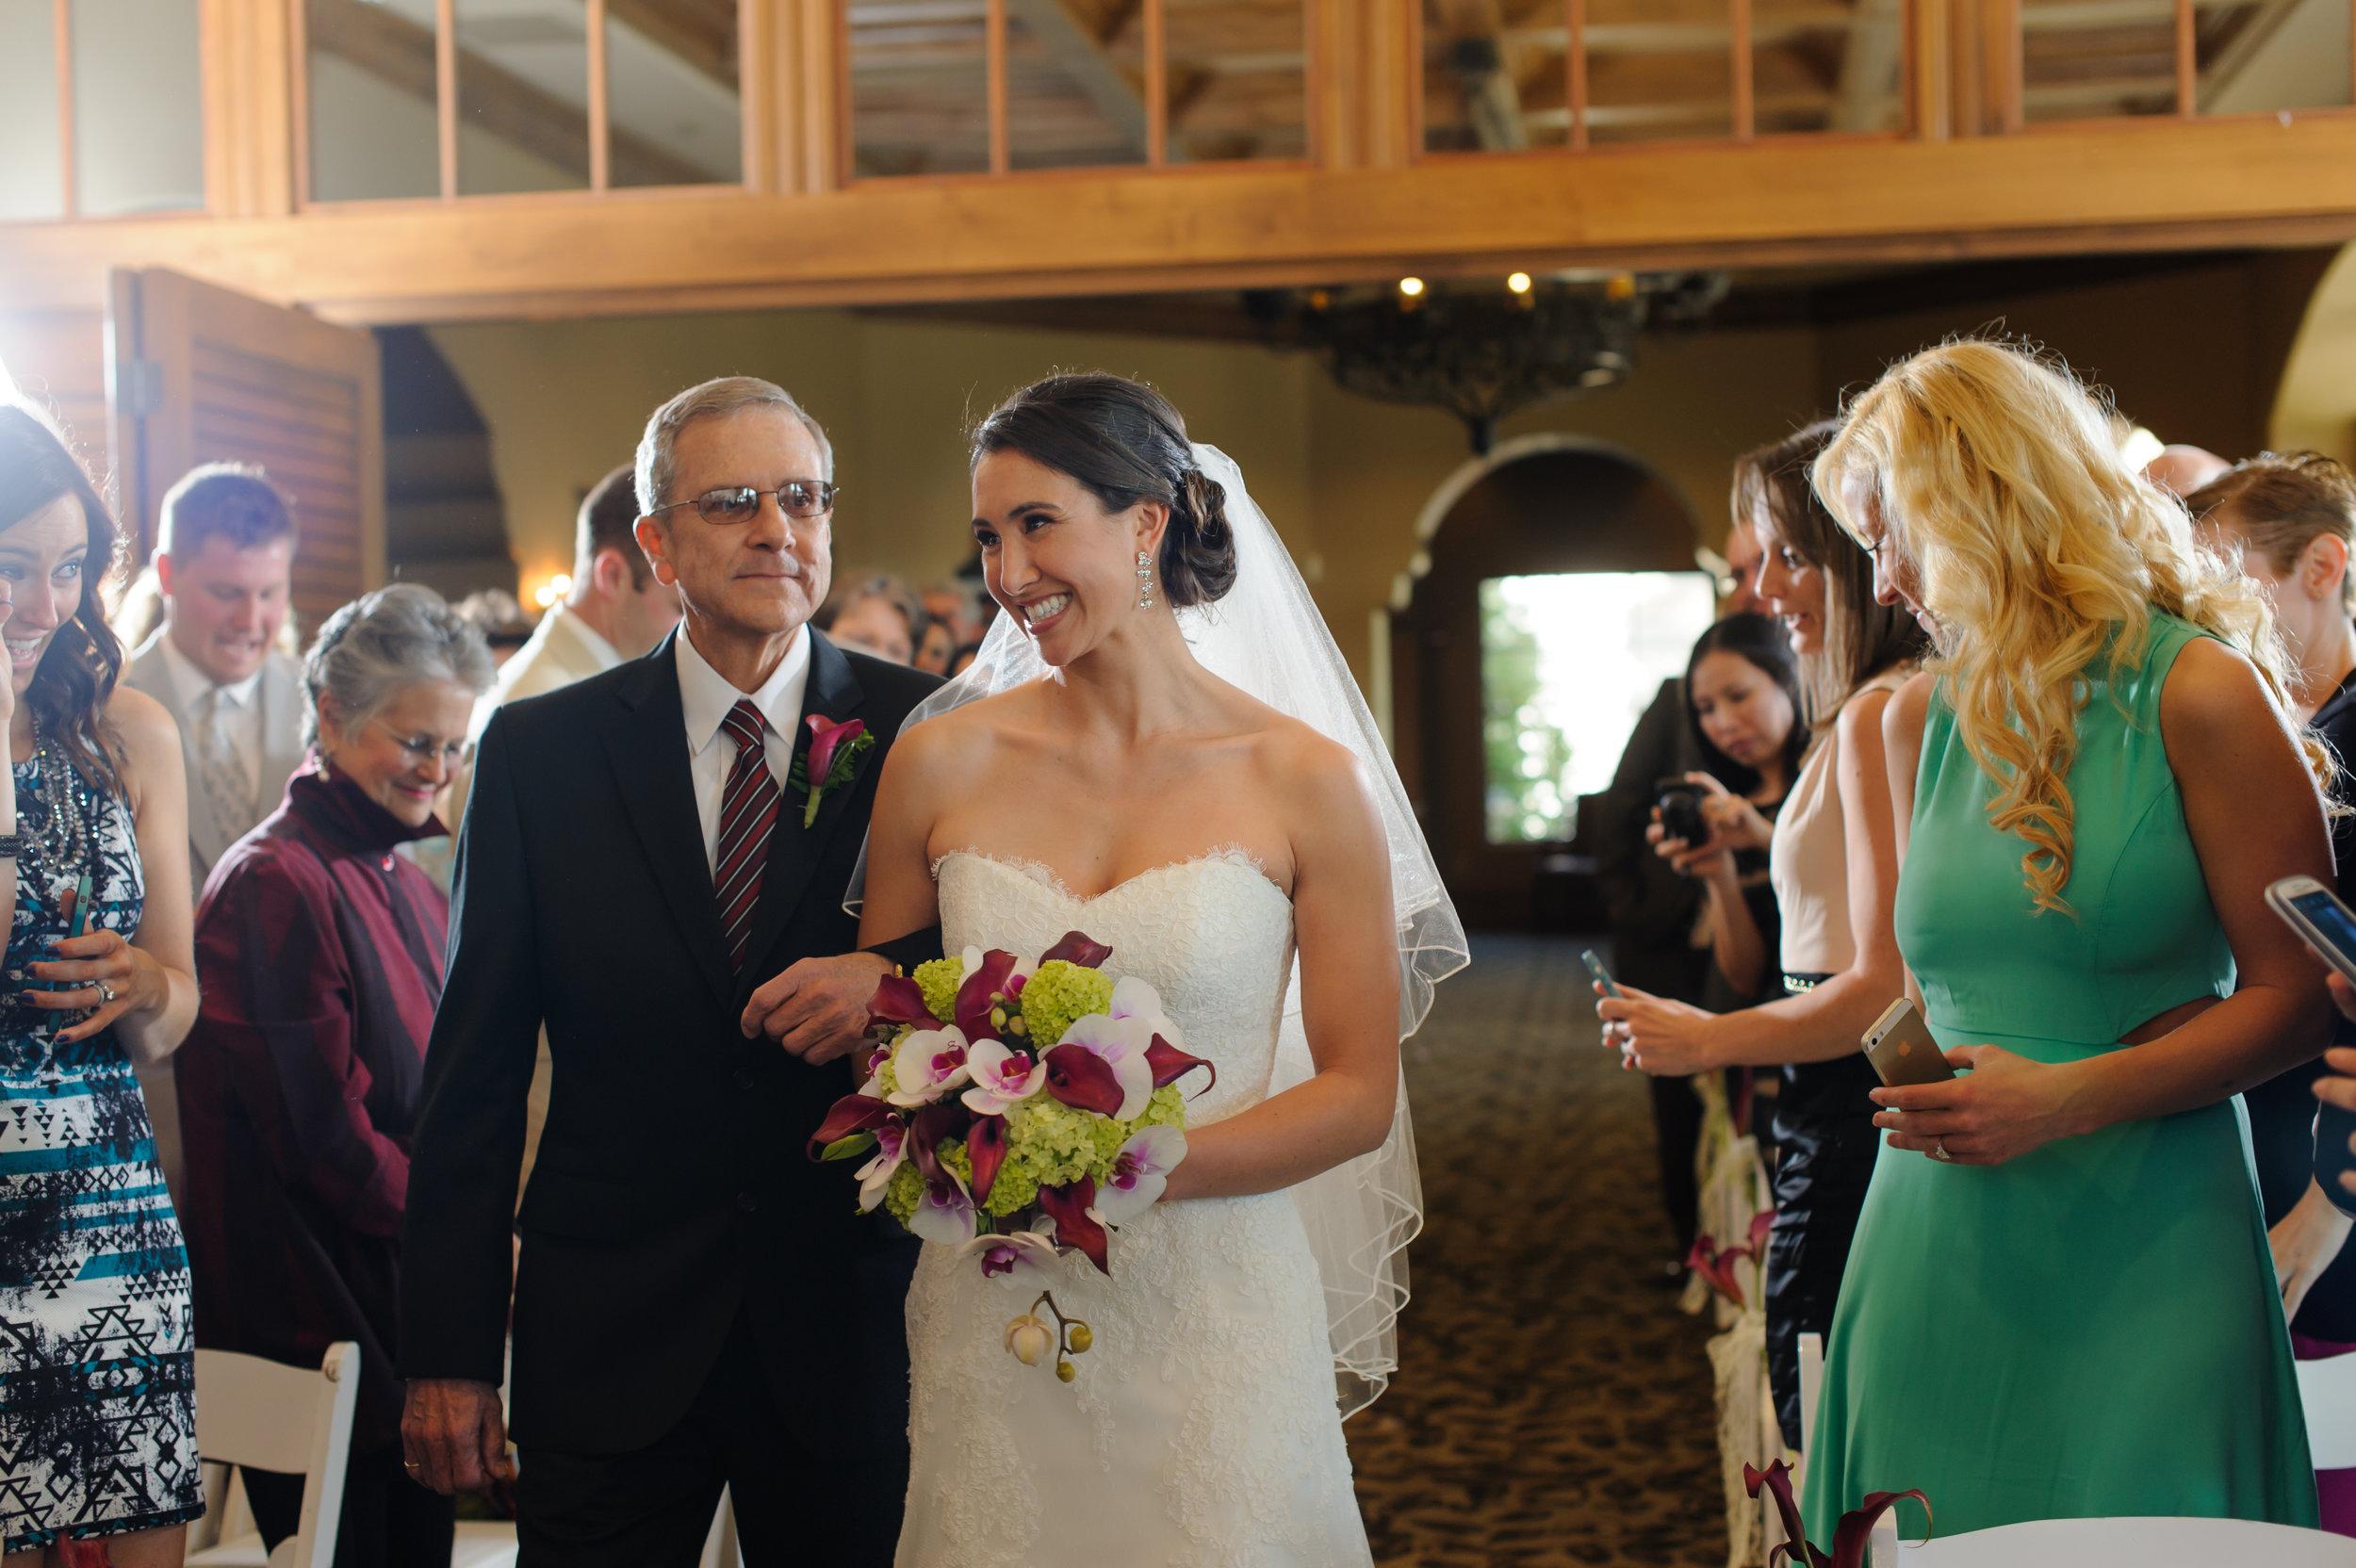 lindsey-jake-017-the-bridges-golf-course-san-ramon-wedding-photographer-katherine-nicole-photography.JPG